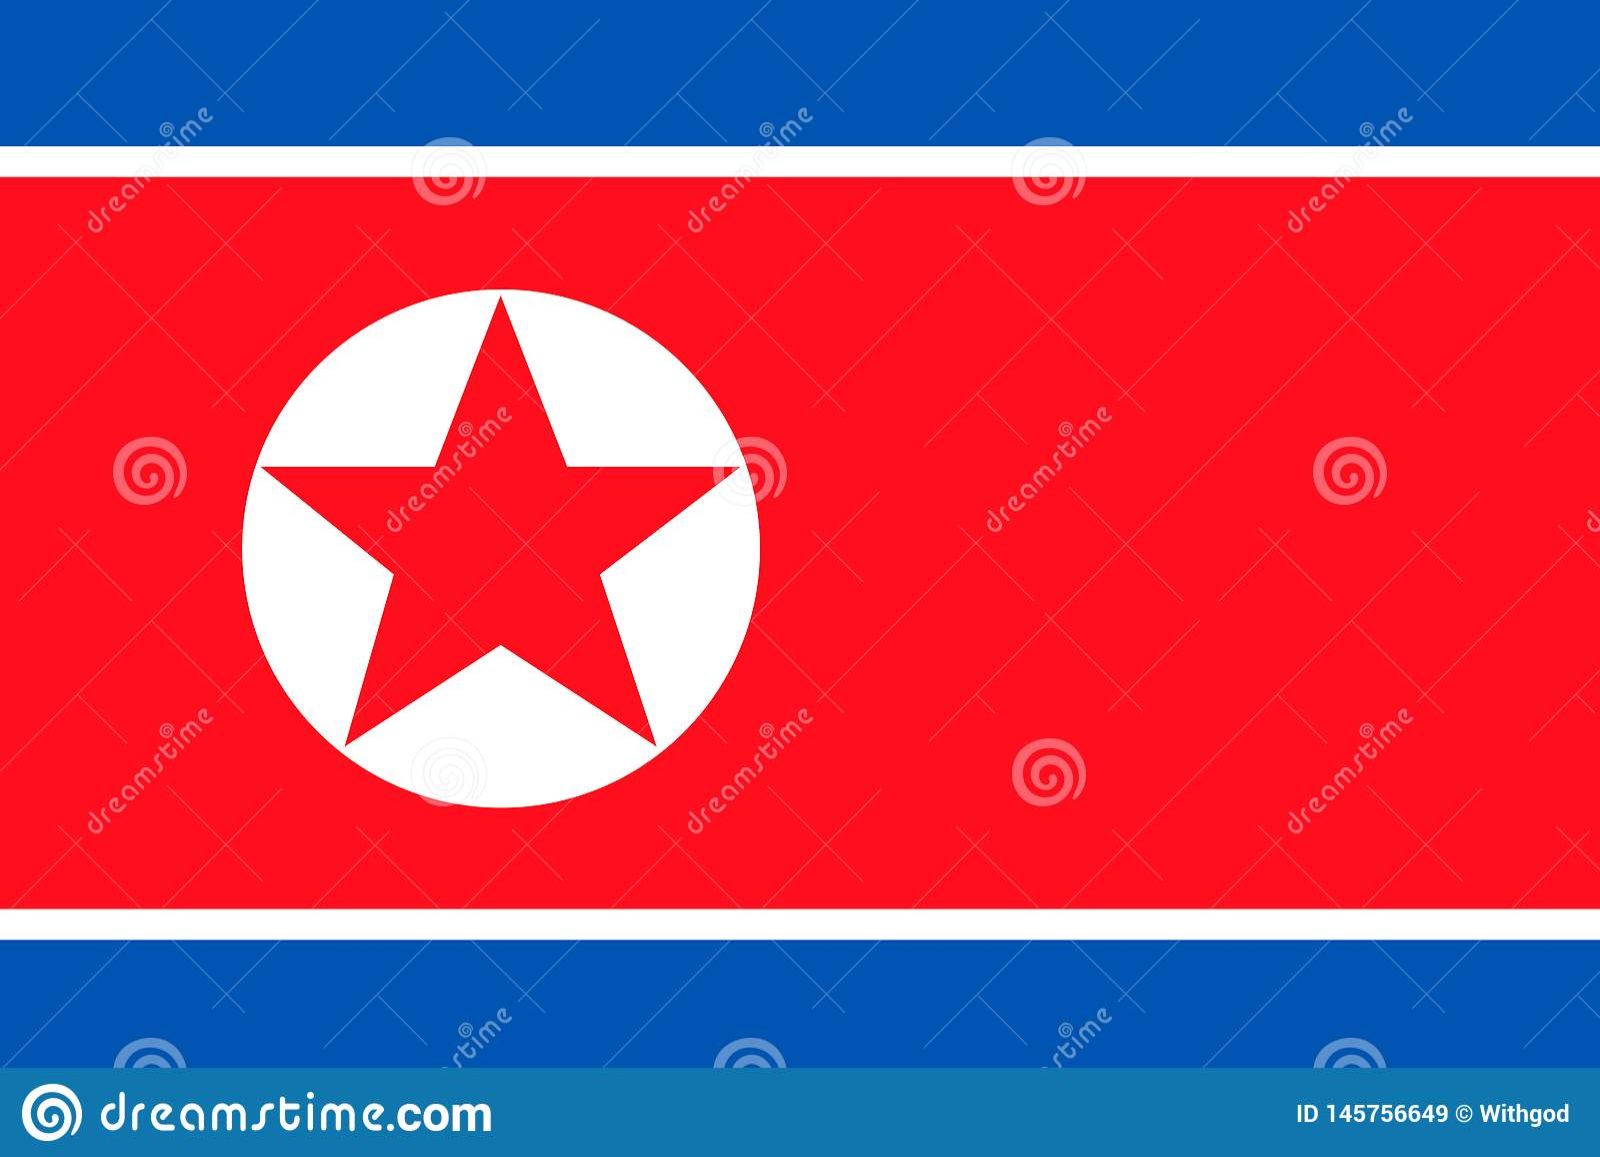 North korea flag